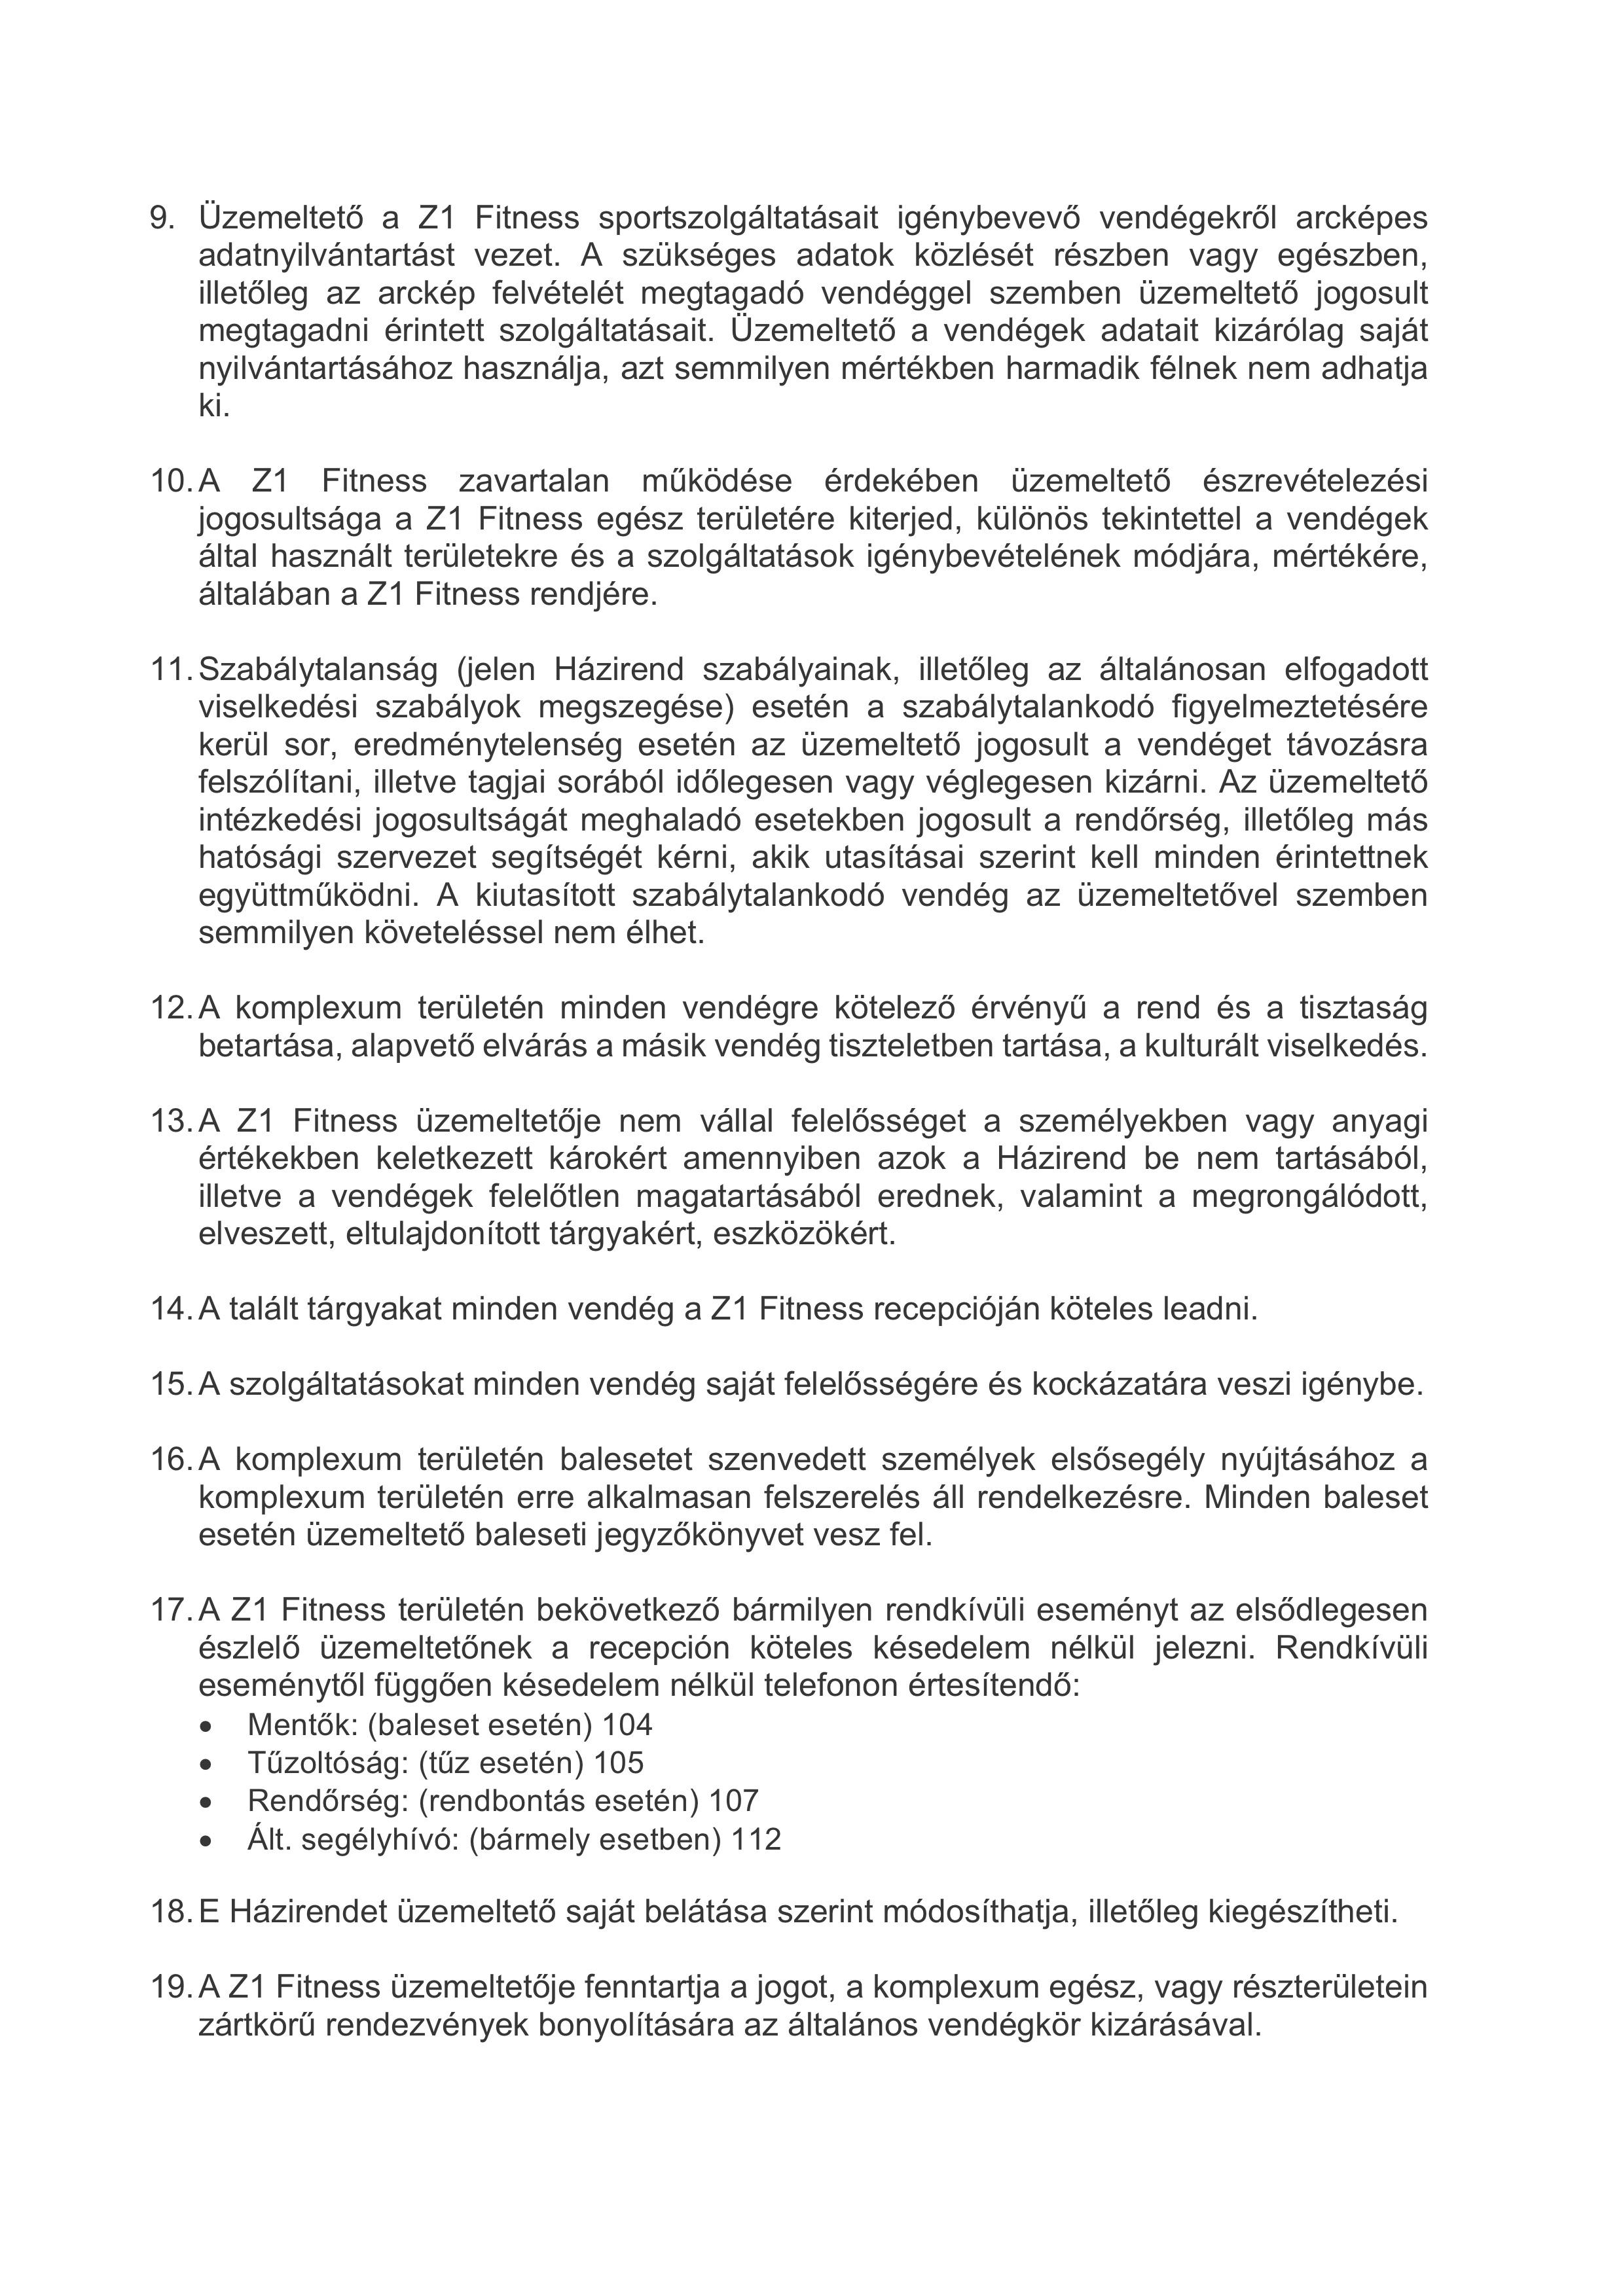 altalanos_szabalyok2